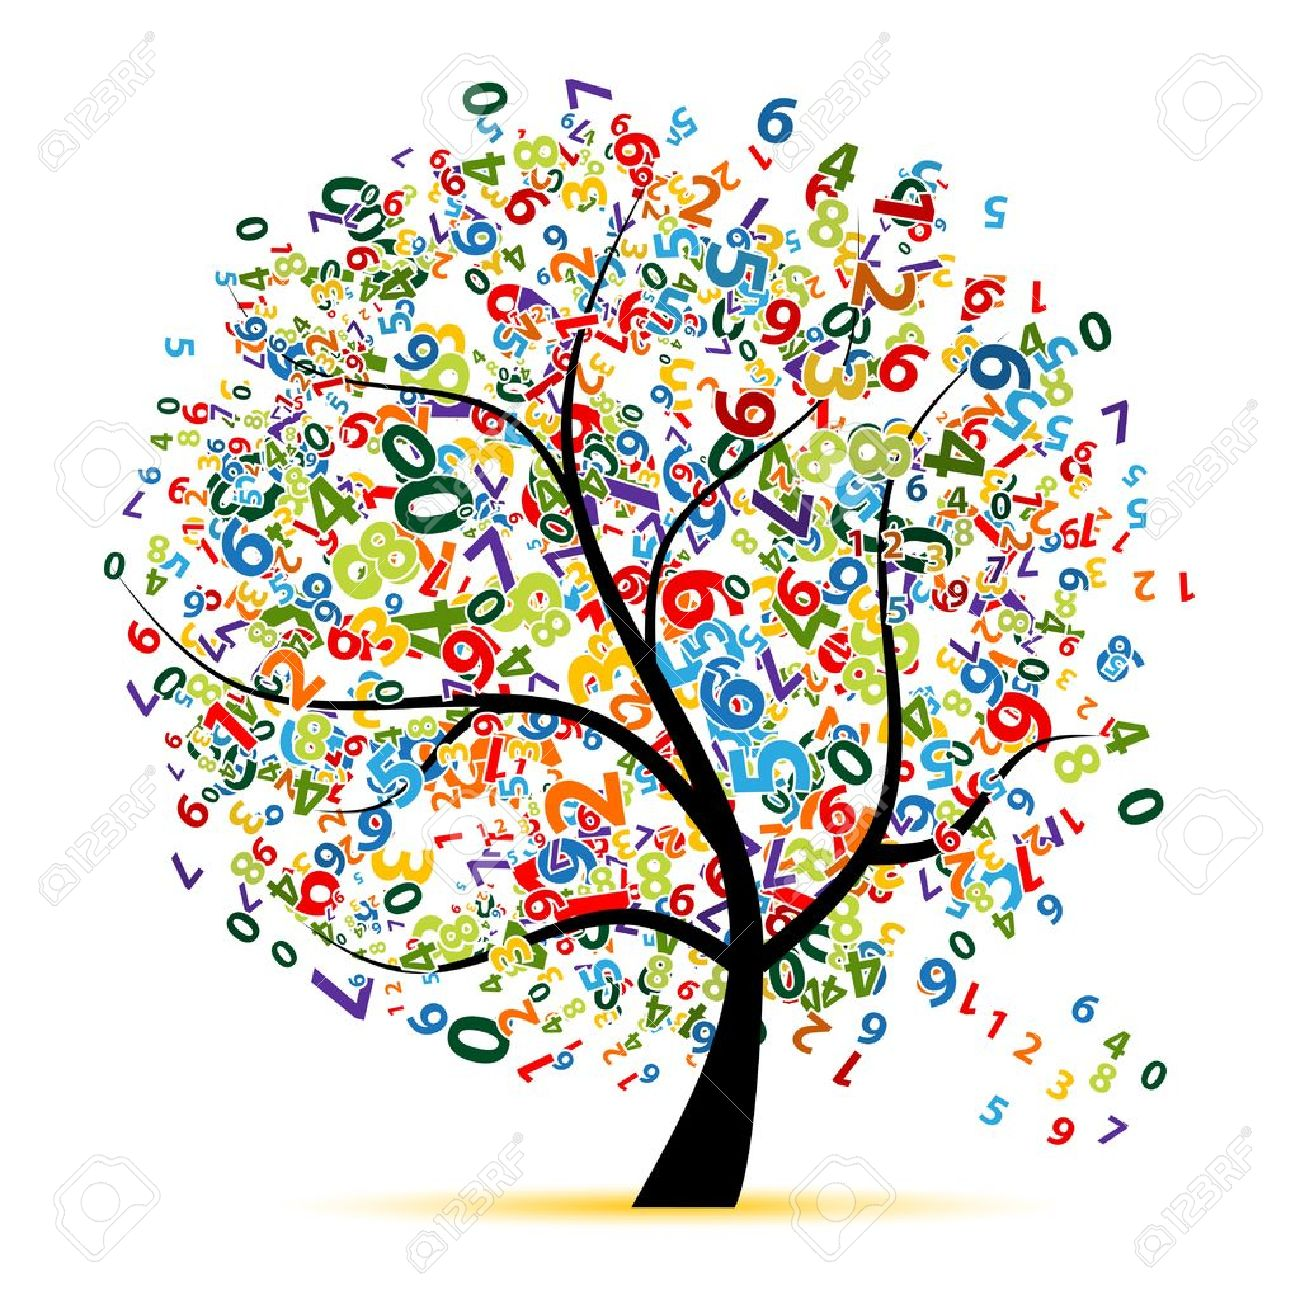 8592005-Digital-tree-for-your-design-Stock-Vector-education-mathematics-school.jpg (1300×1300)